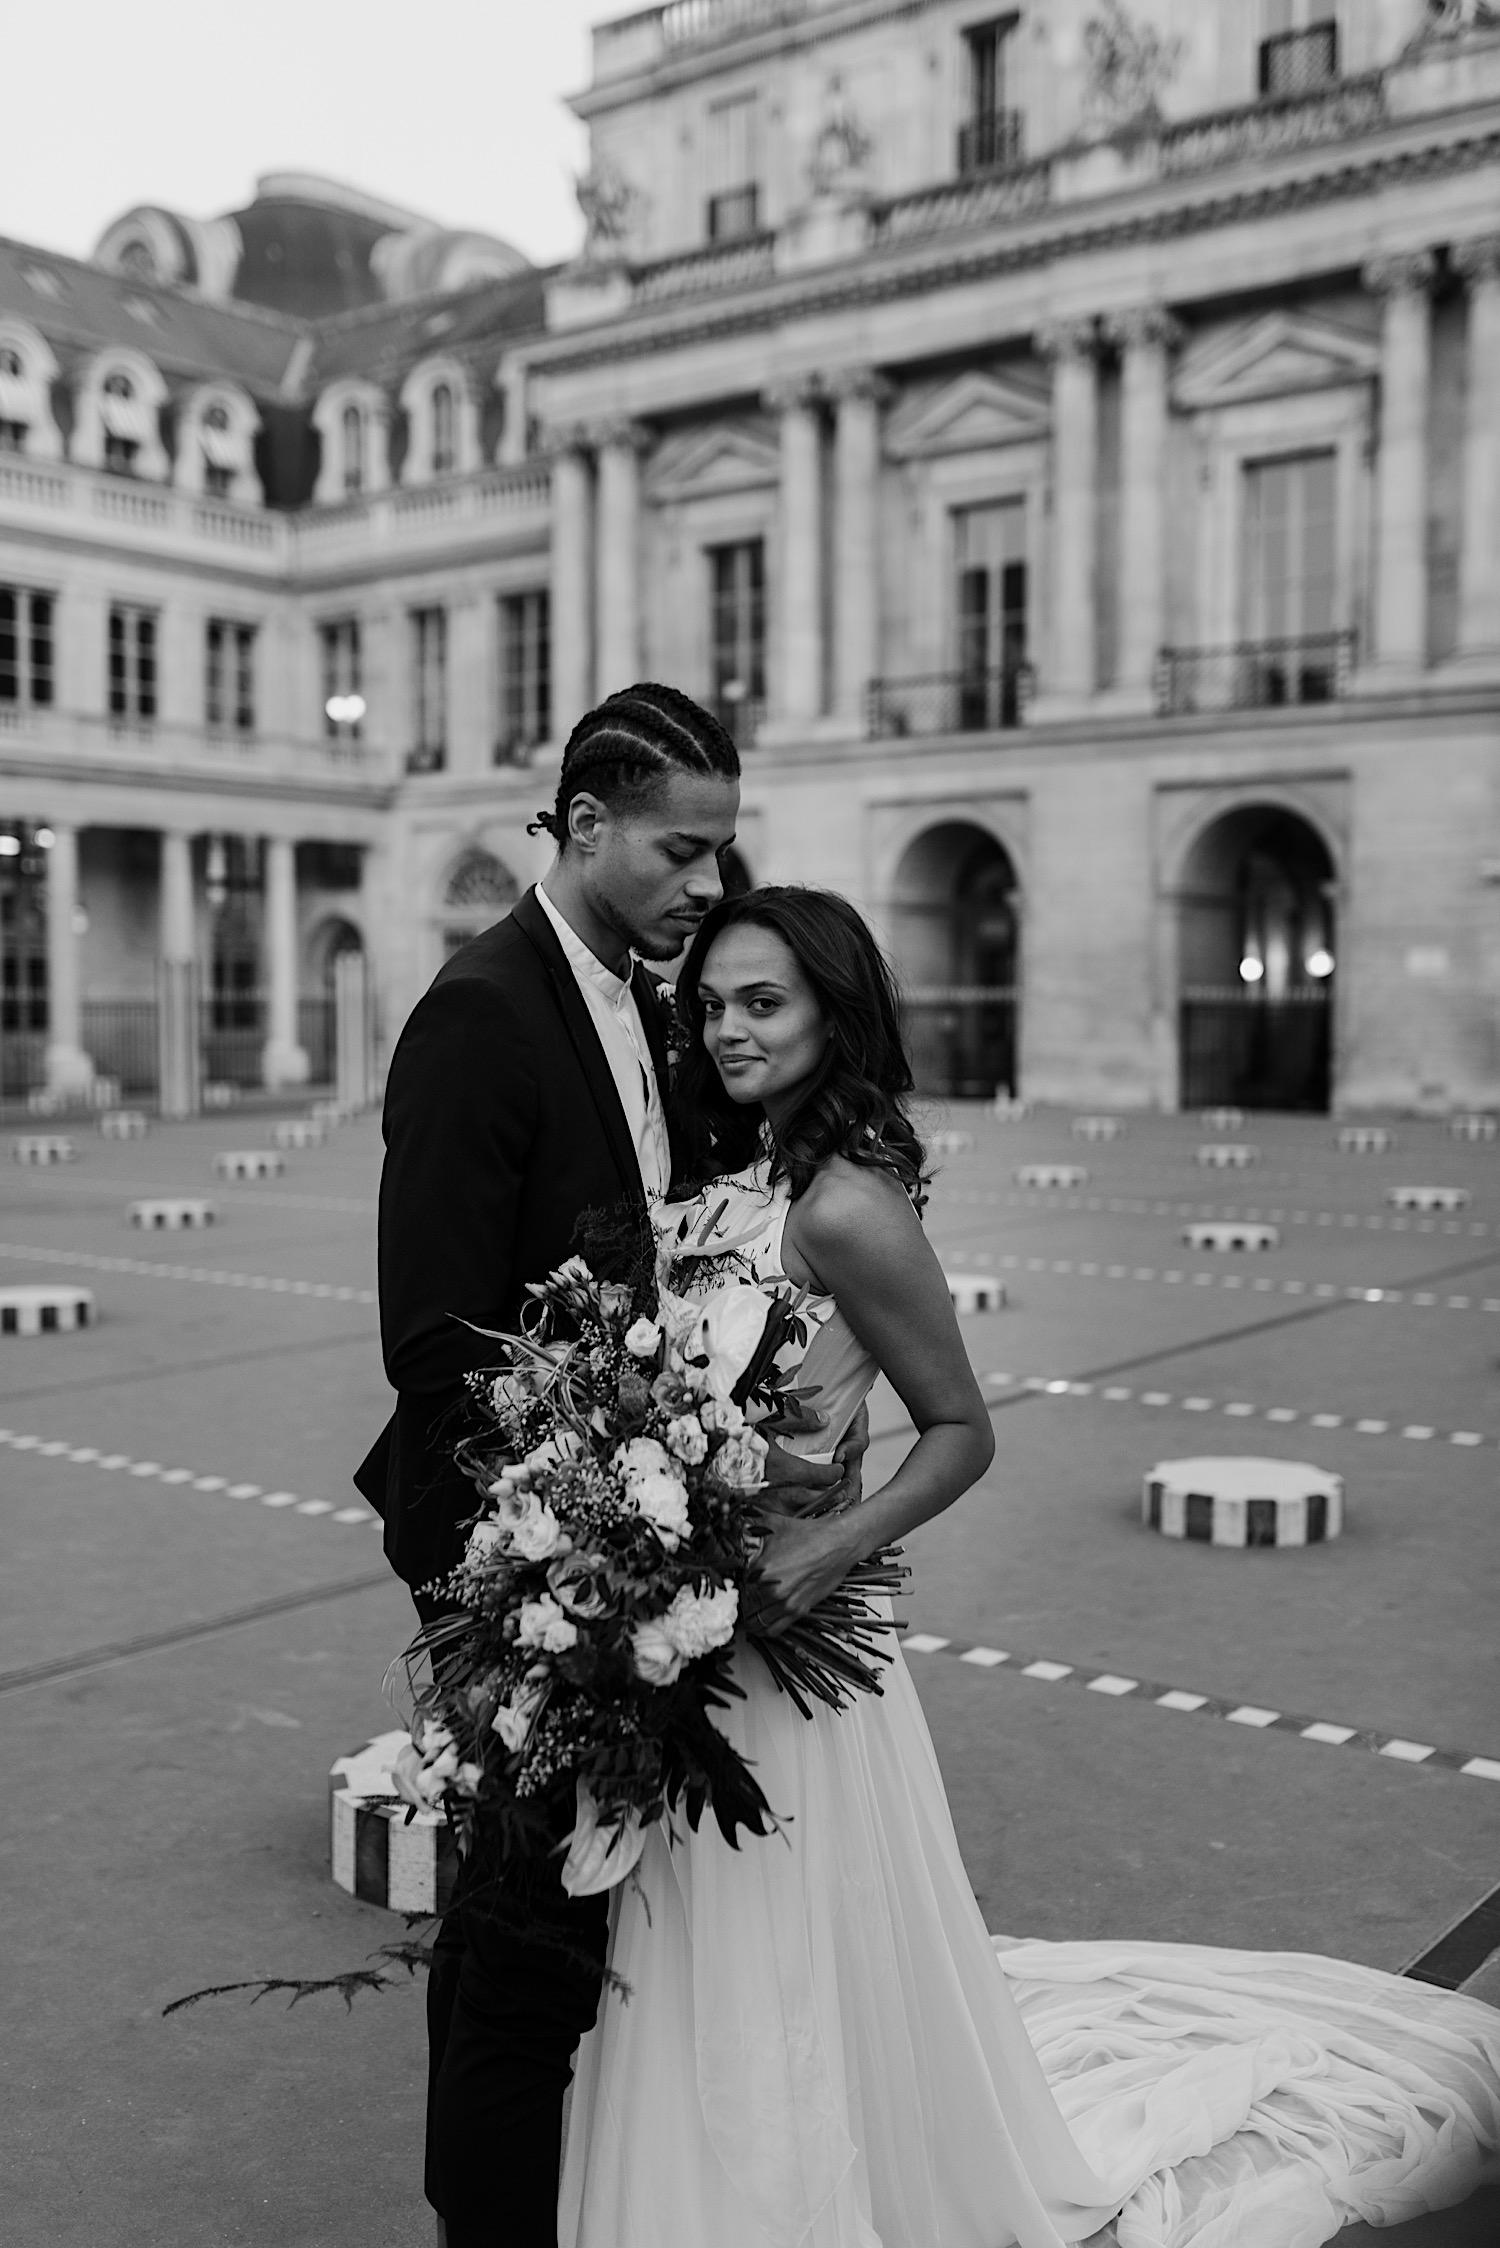 Paris Louvre Wedding Photos Paris Wedding Photographer Destination Wedding France Anais Possamai Photography 19